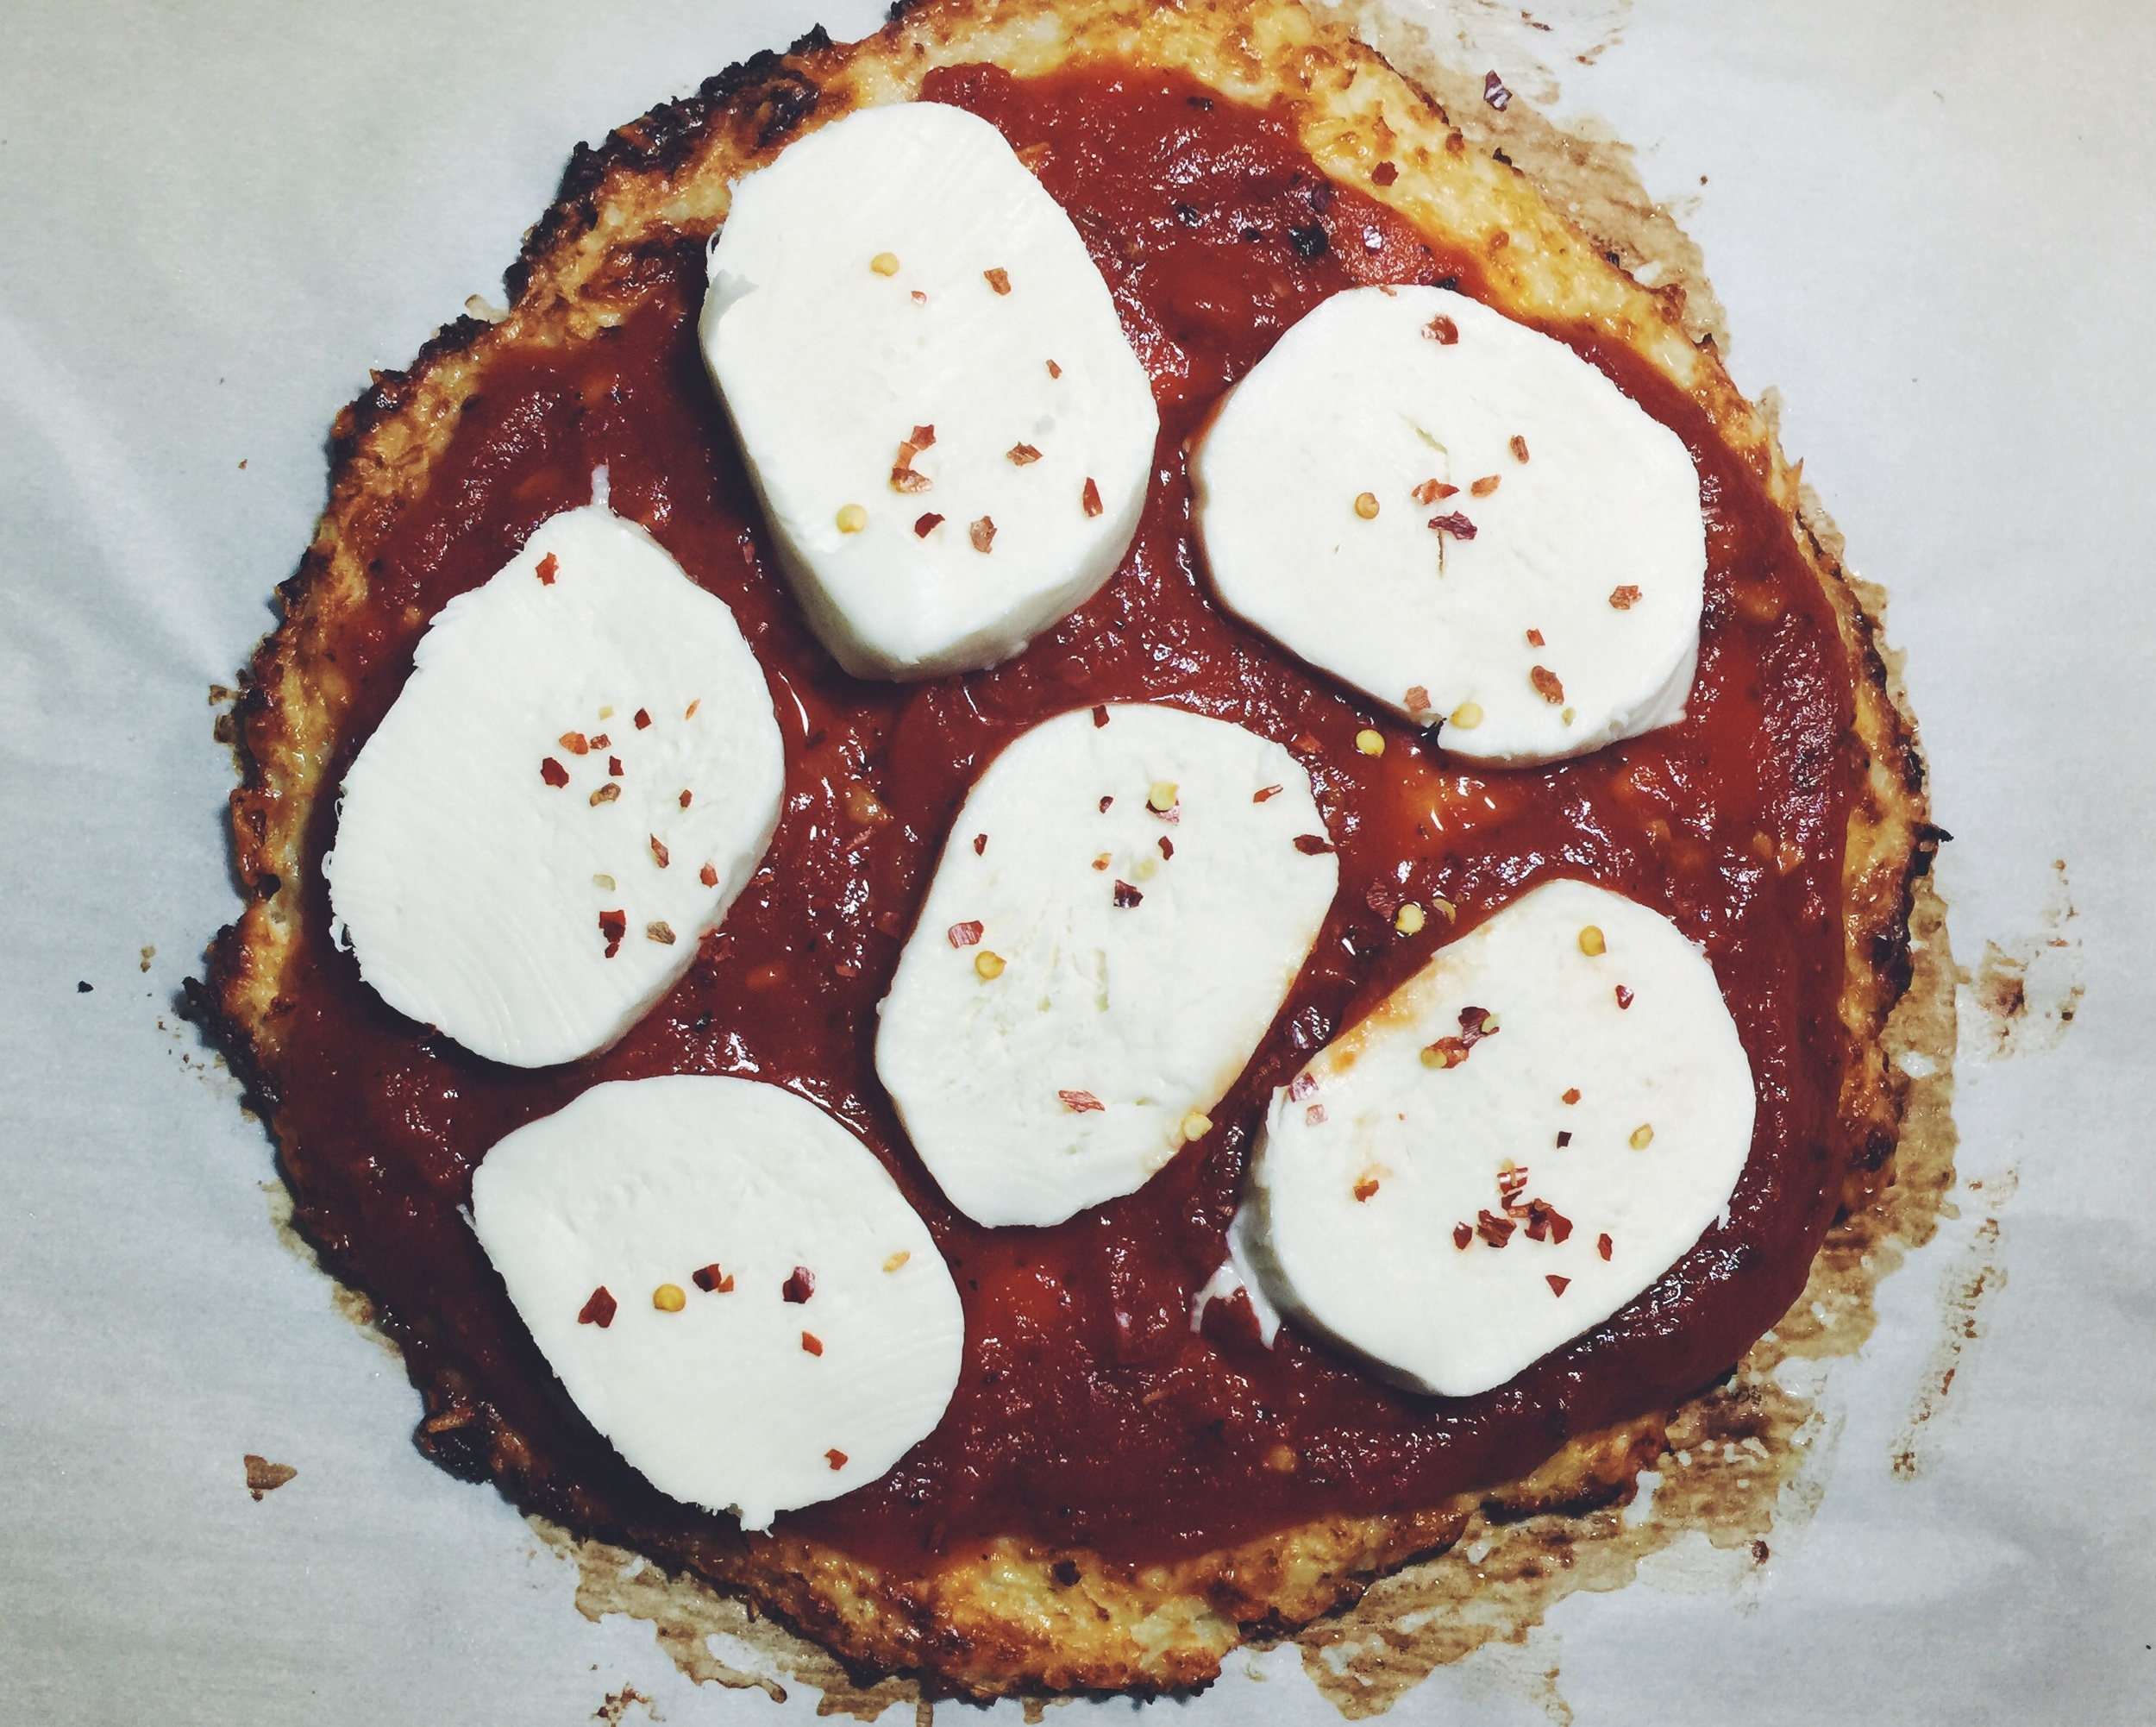 mozzarella on top